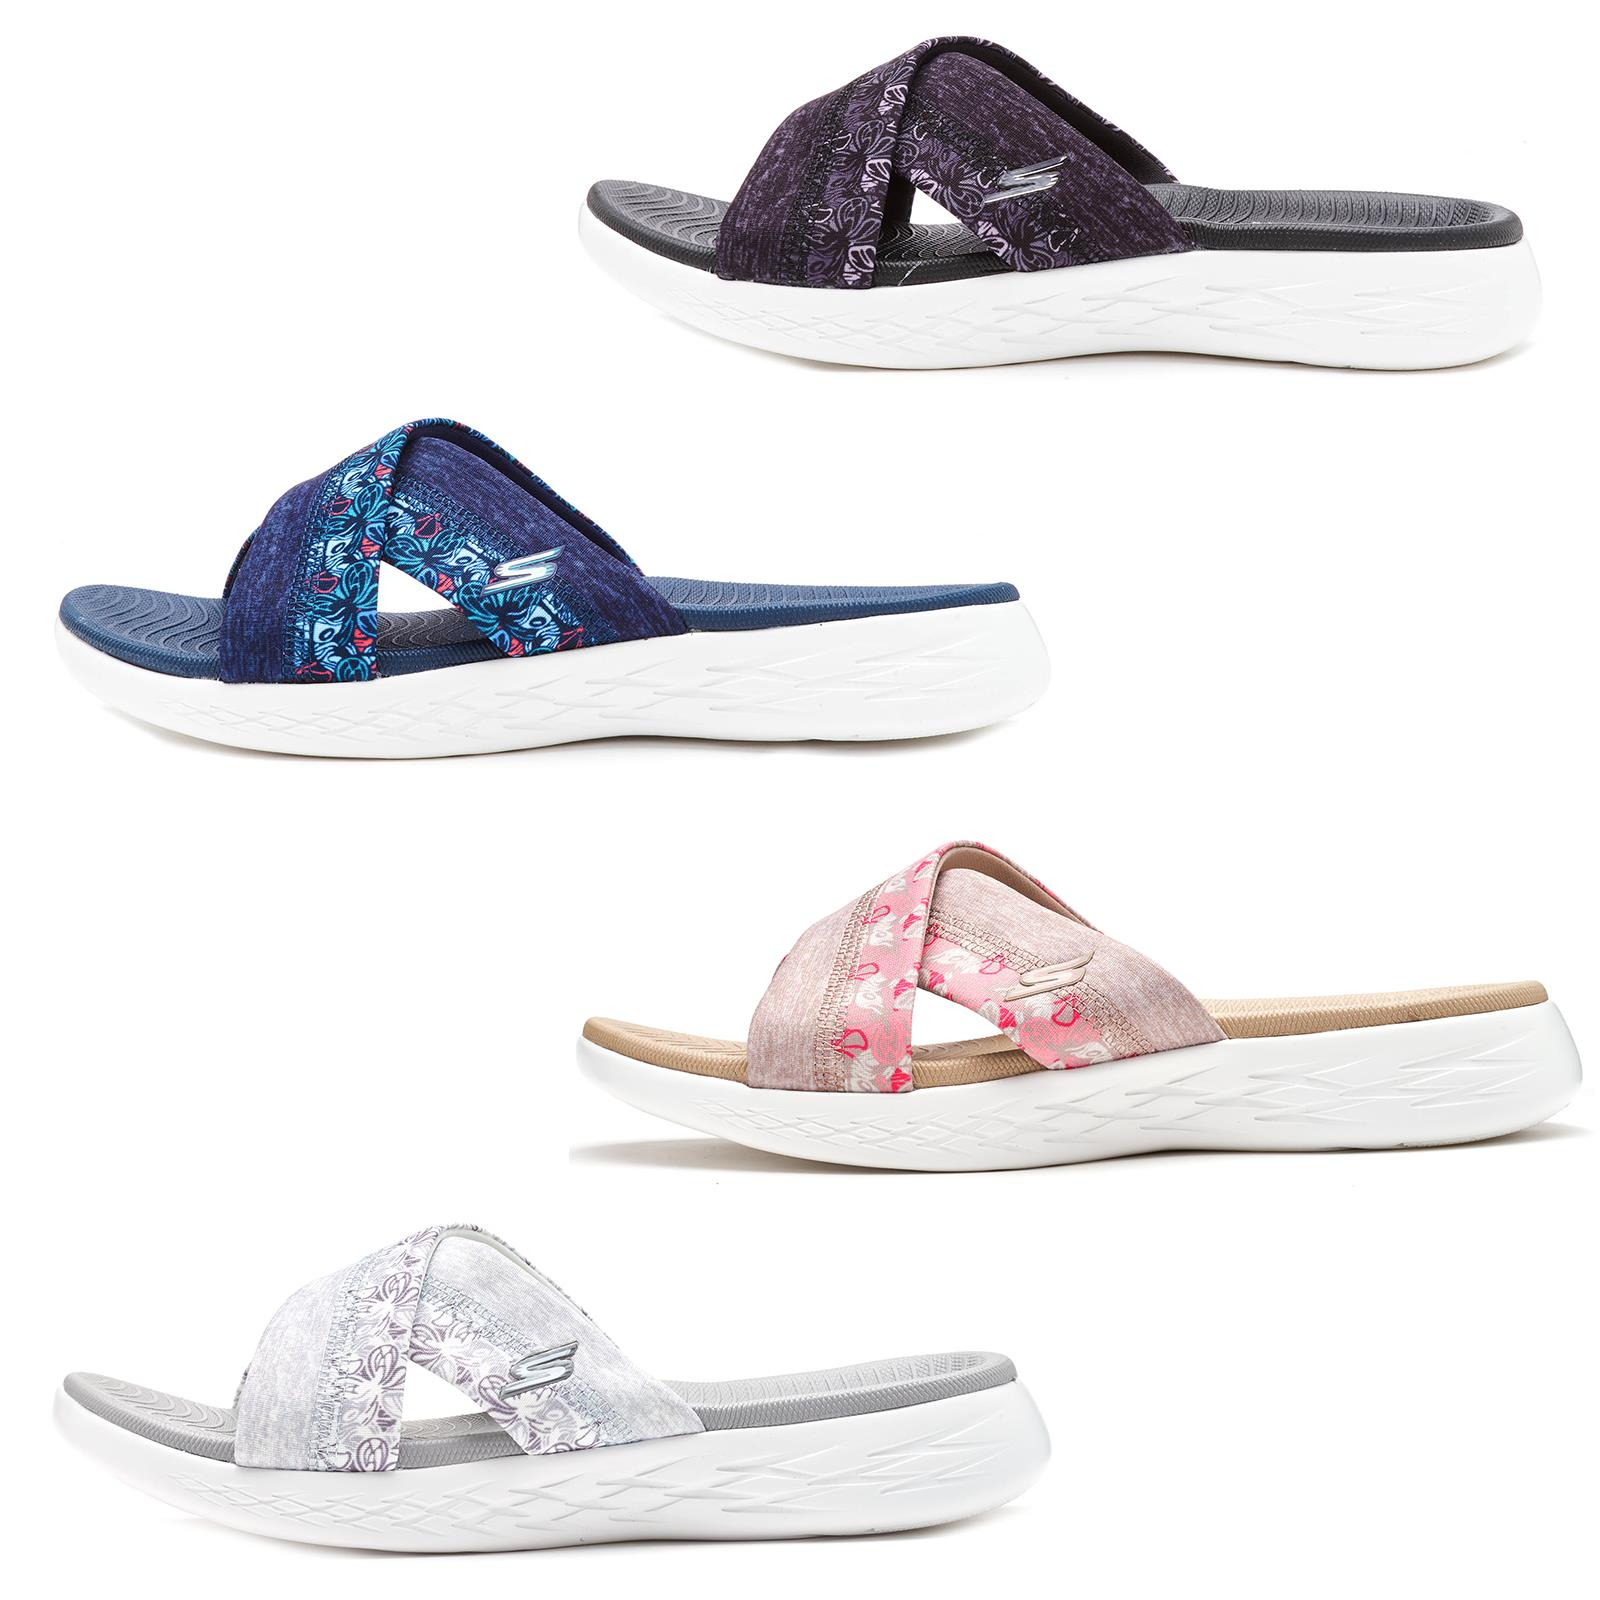 Details zu Skechers On the Go 600 Monarch Cross Strap Slide Summer Women Sandals 15306